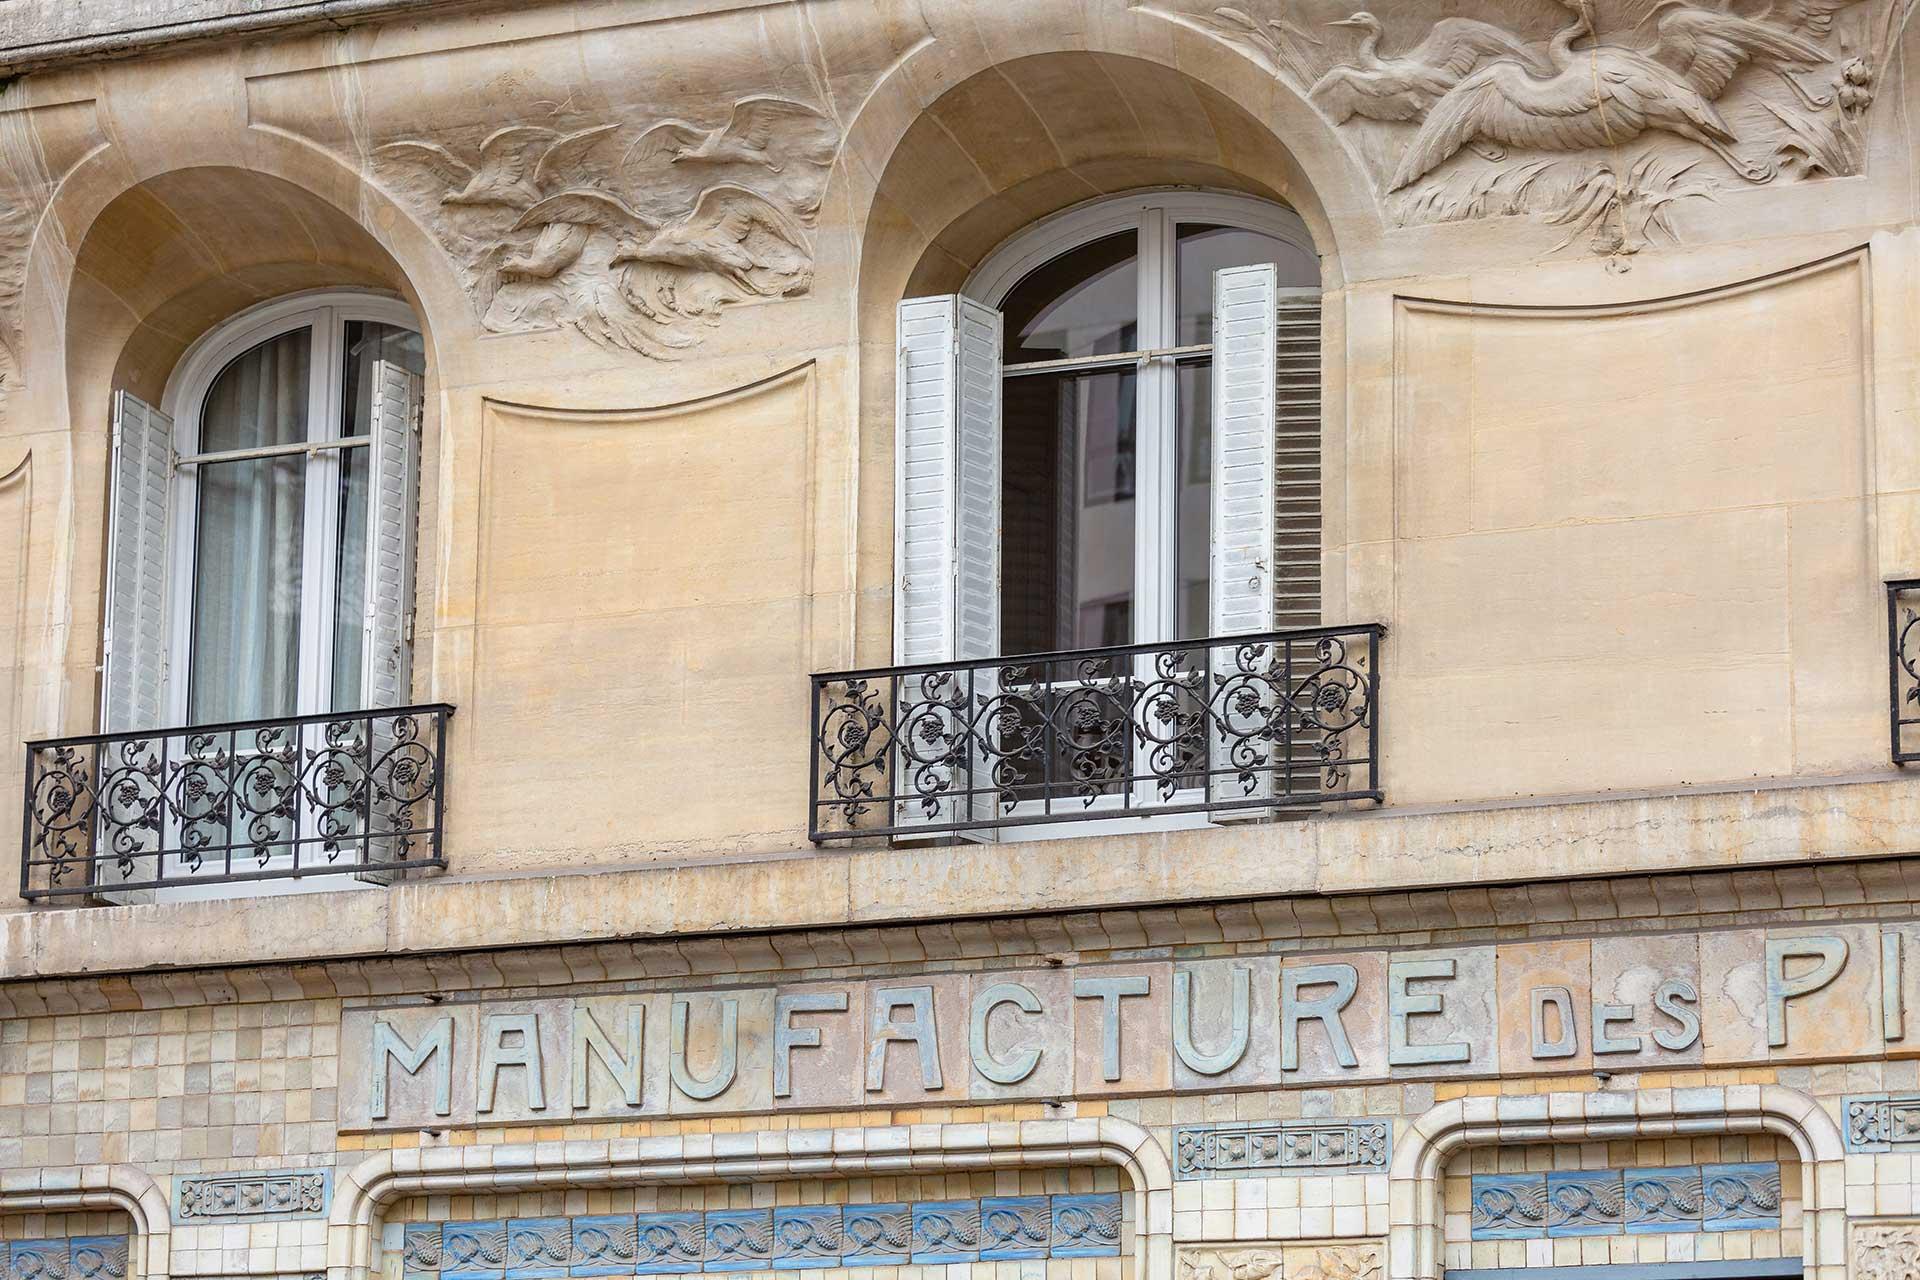 92 Rue Anatole France 92300 Levallois-Perret